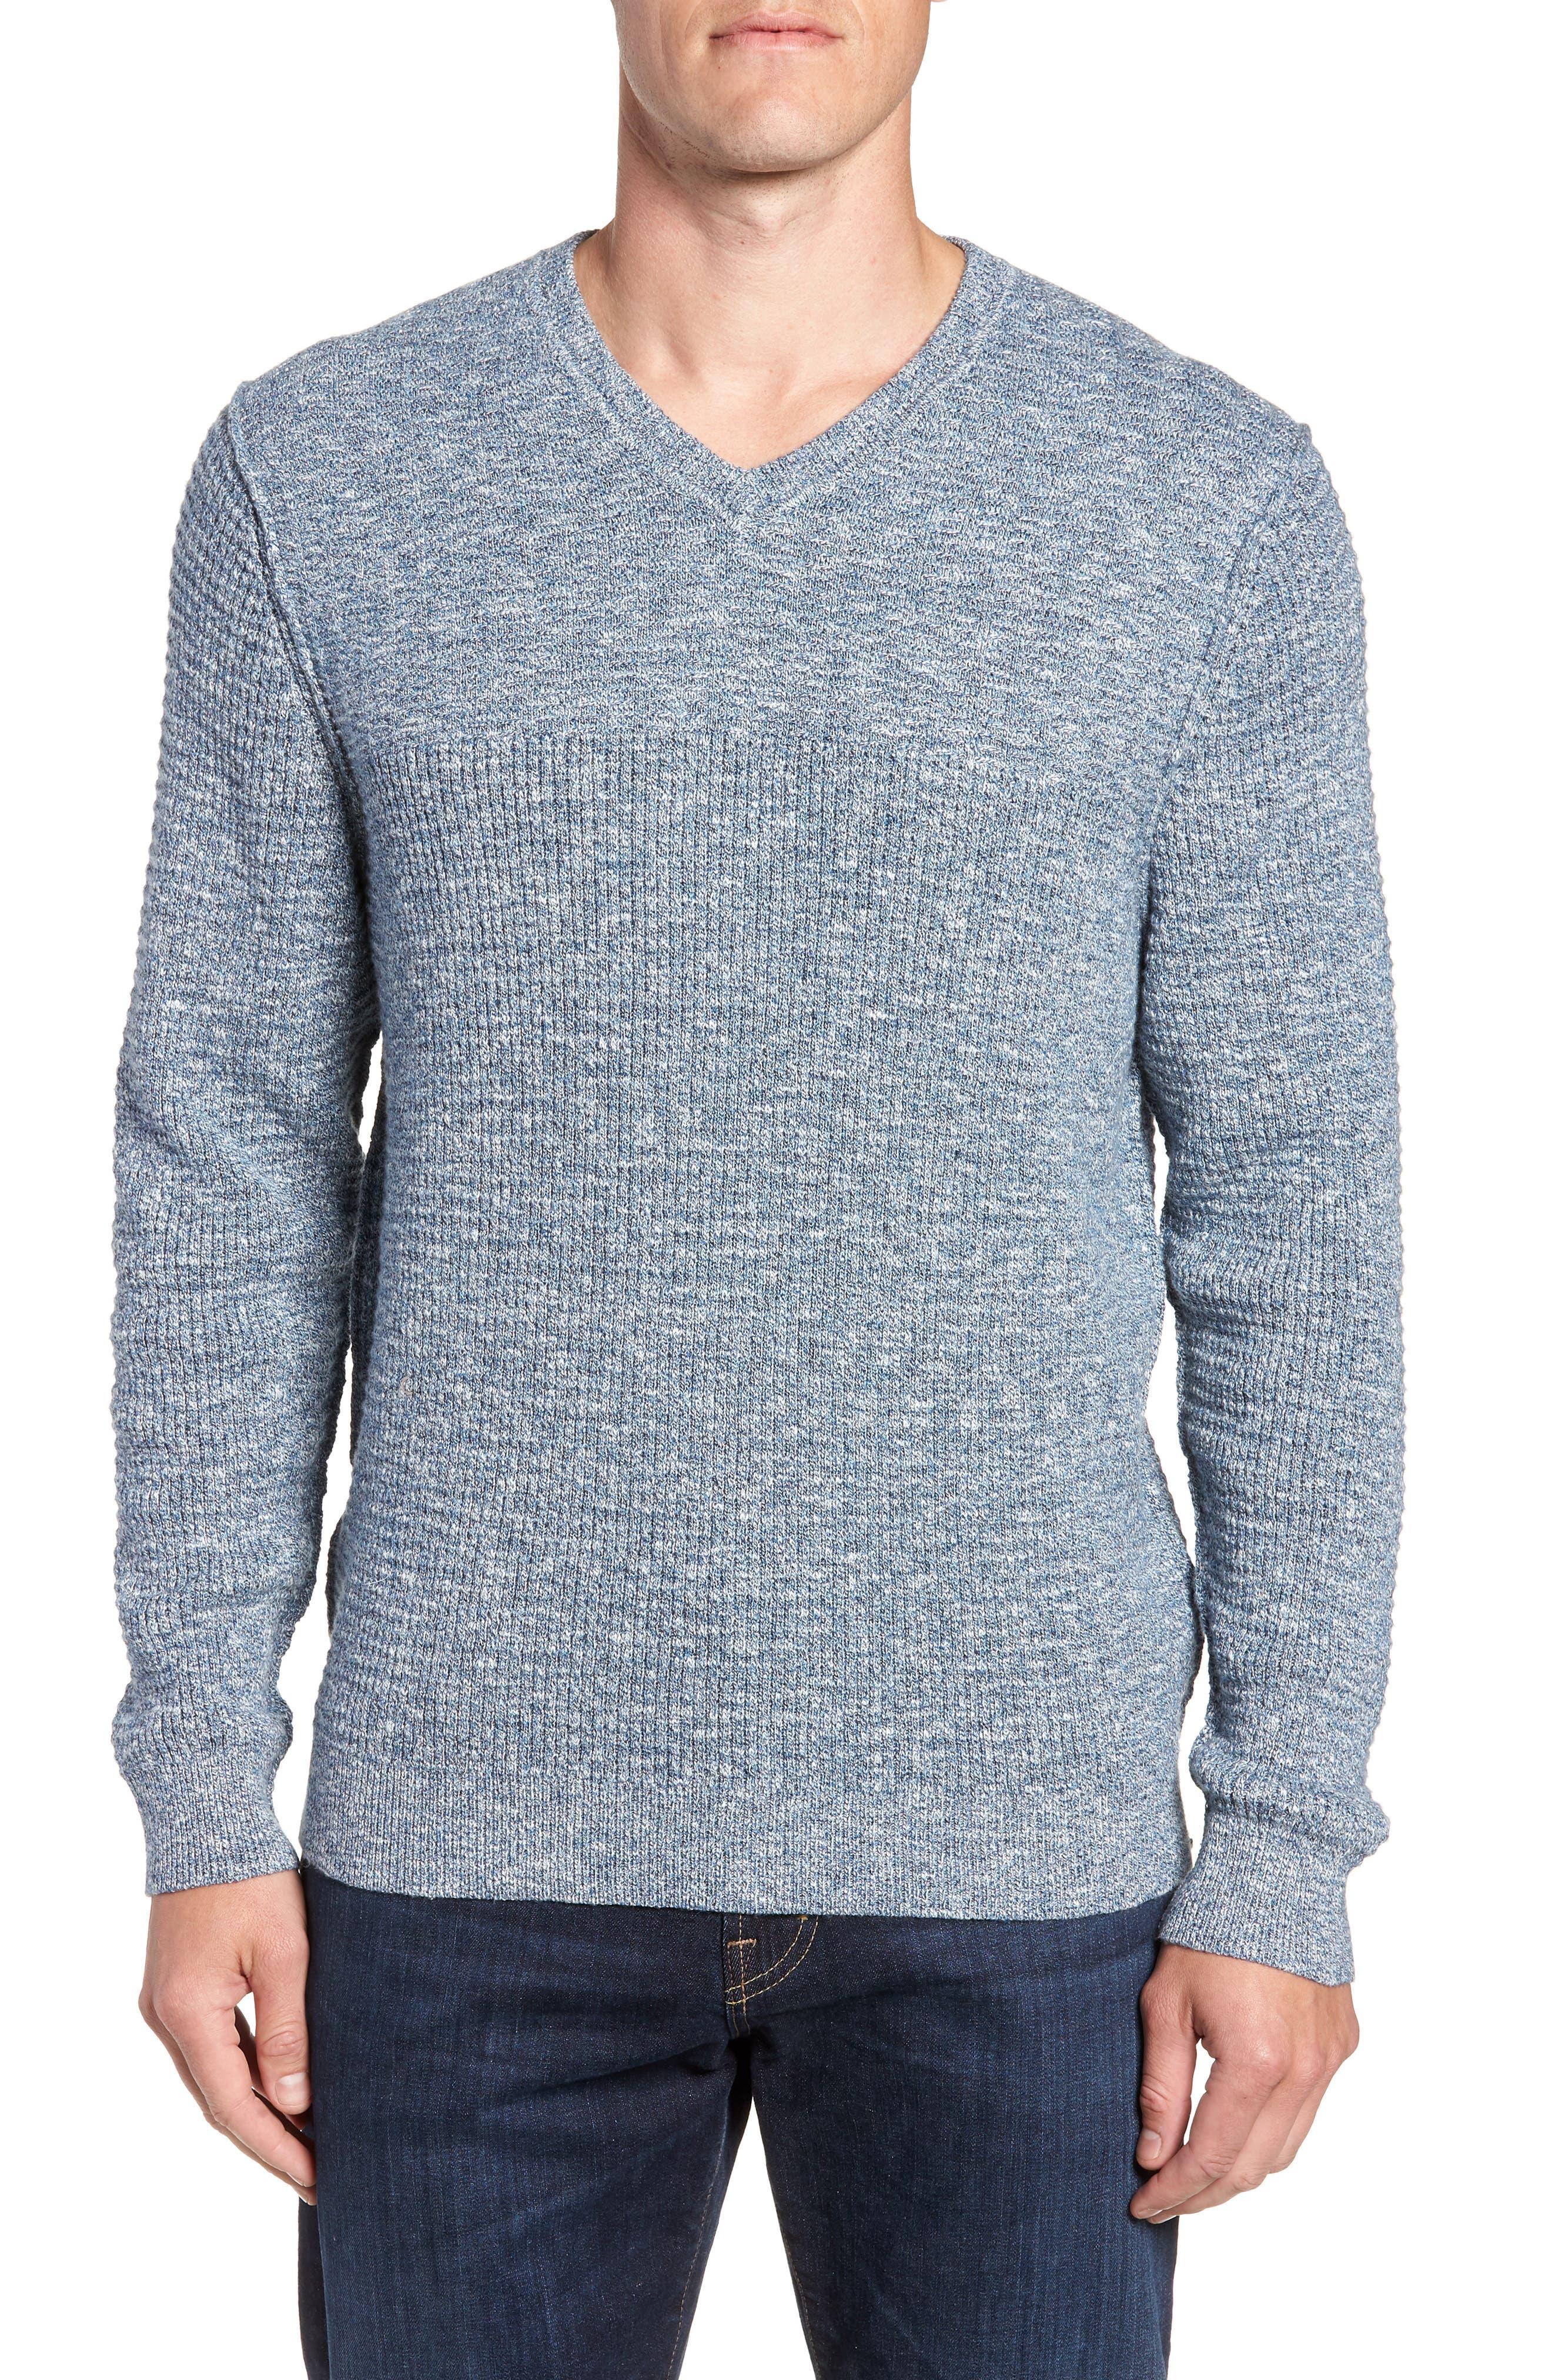 Tommy Bahama Isidro V-Neck Regular Fit Sweater, Blue